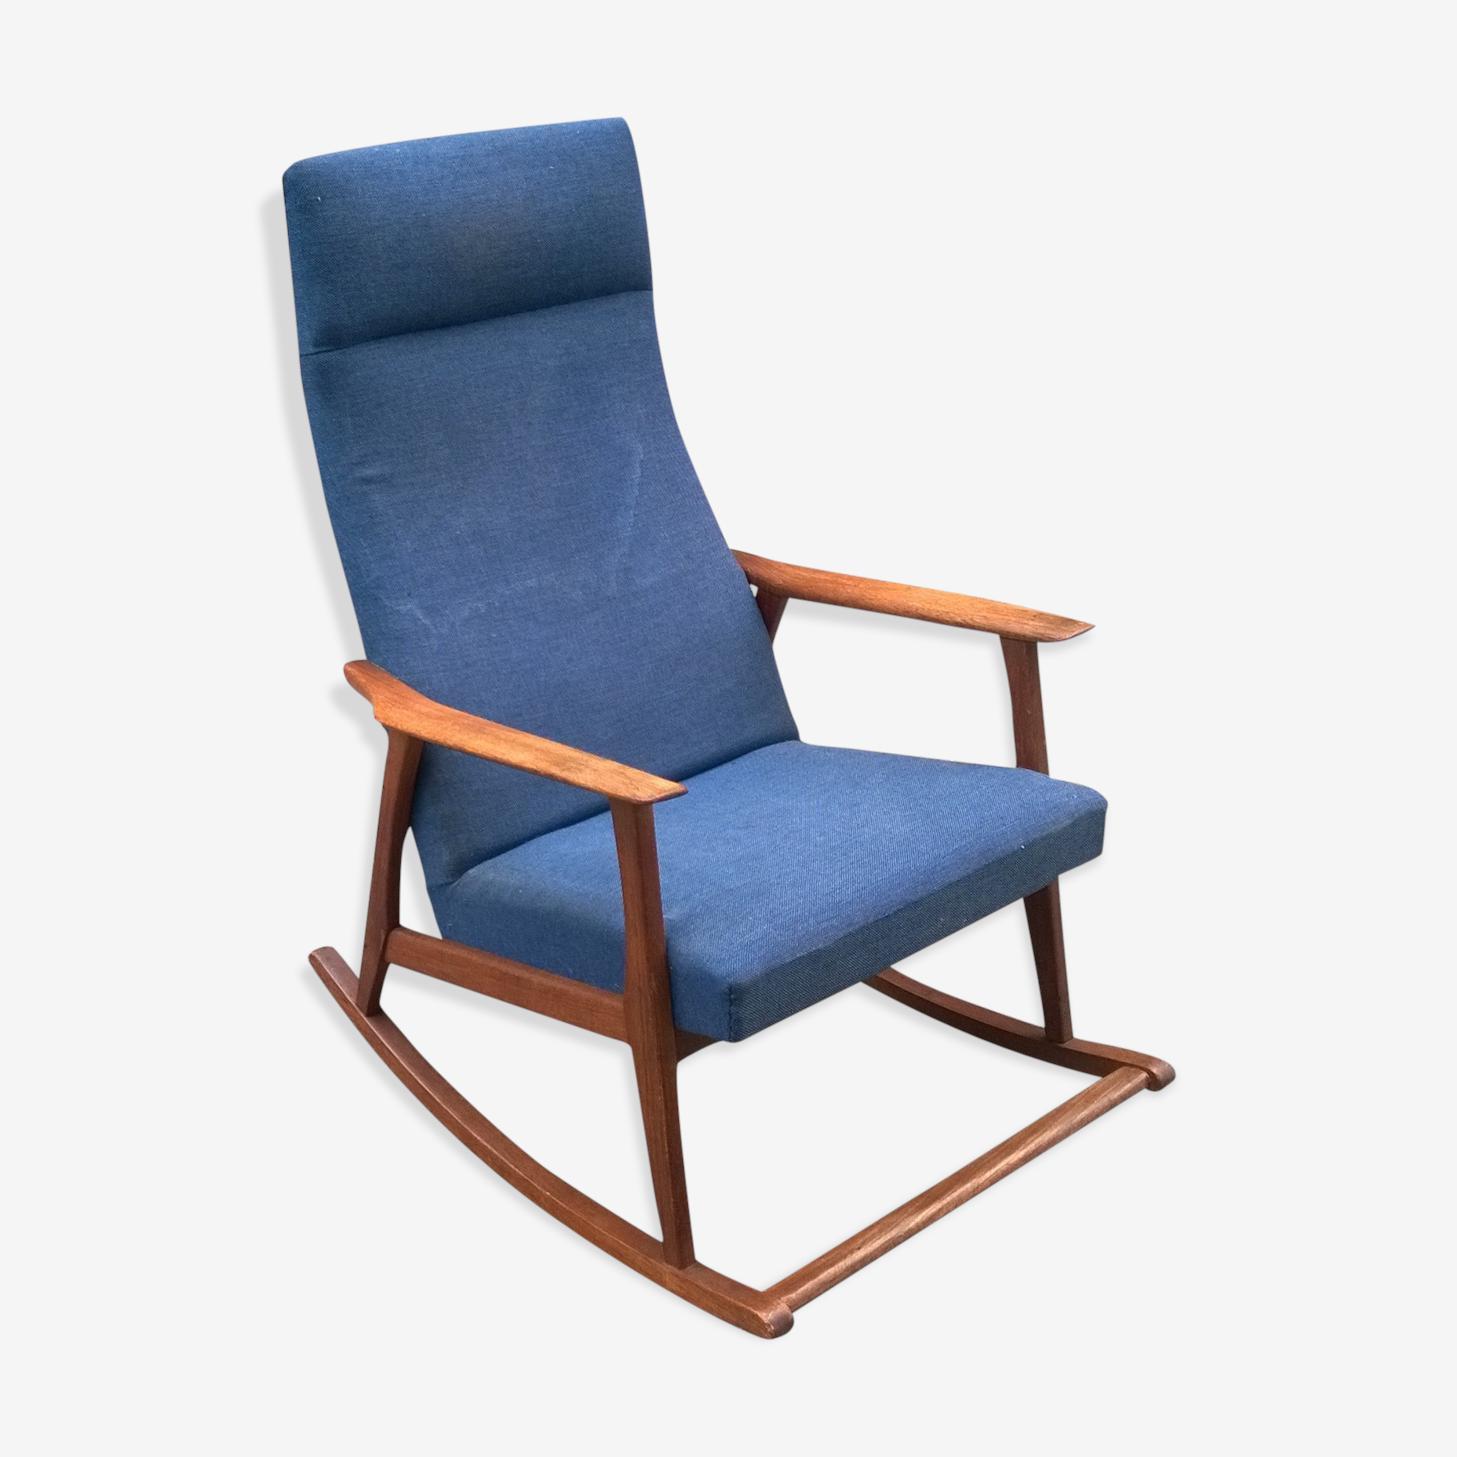 Rocking chair scandinave en teck